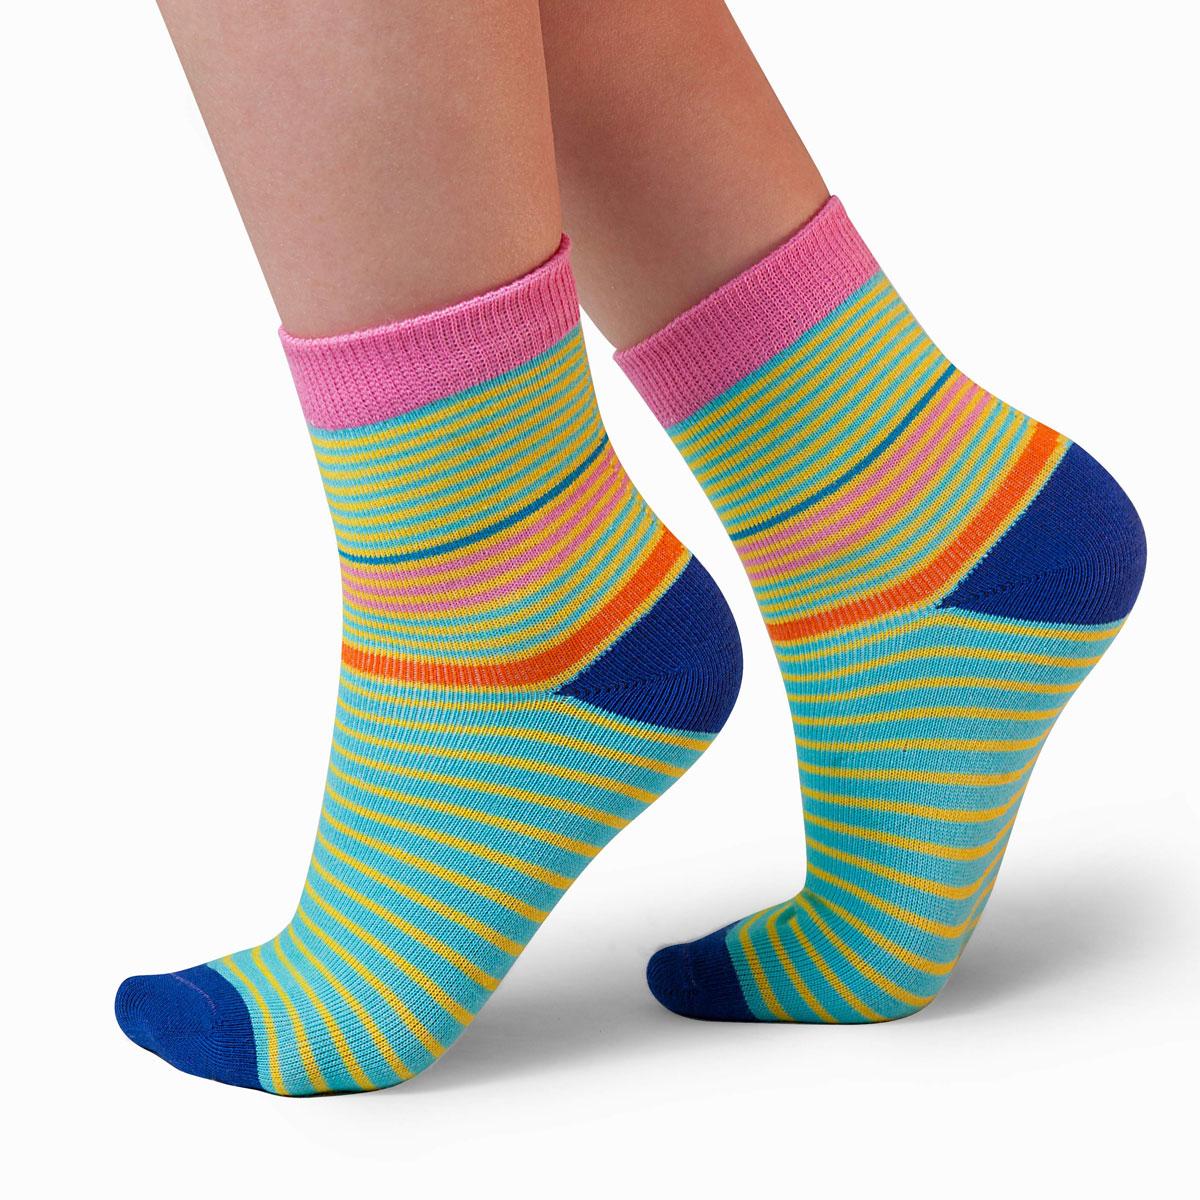 Носки для девочки Idilio, цвет: синий. SG11. Размер 27/29